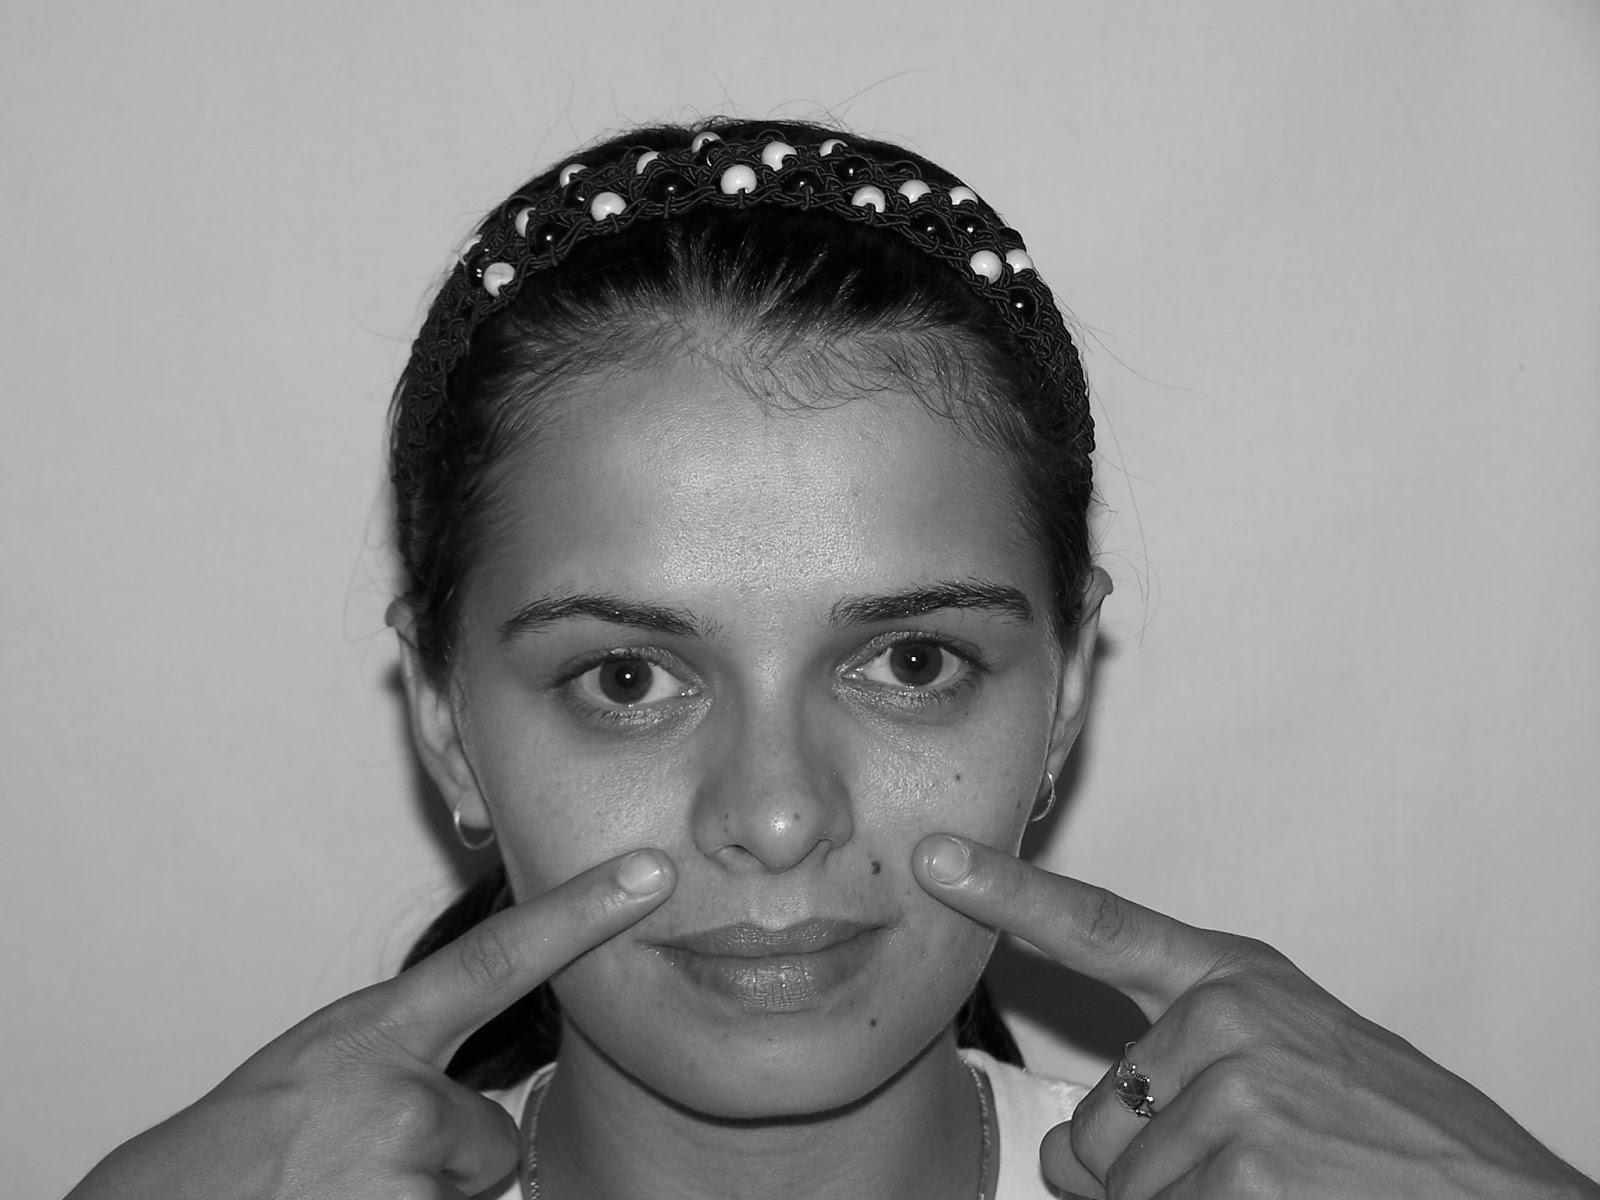 Tighten Hog Jowls And Sagging Face Skin Via Facial Firming Workouts